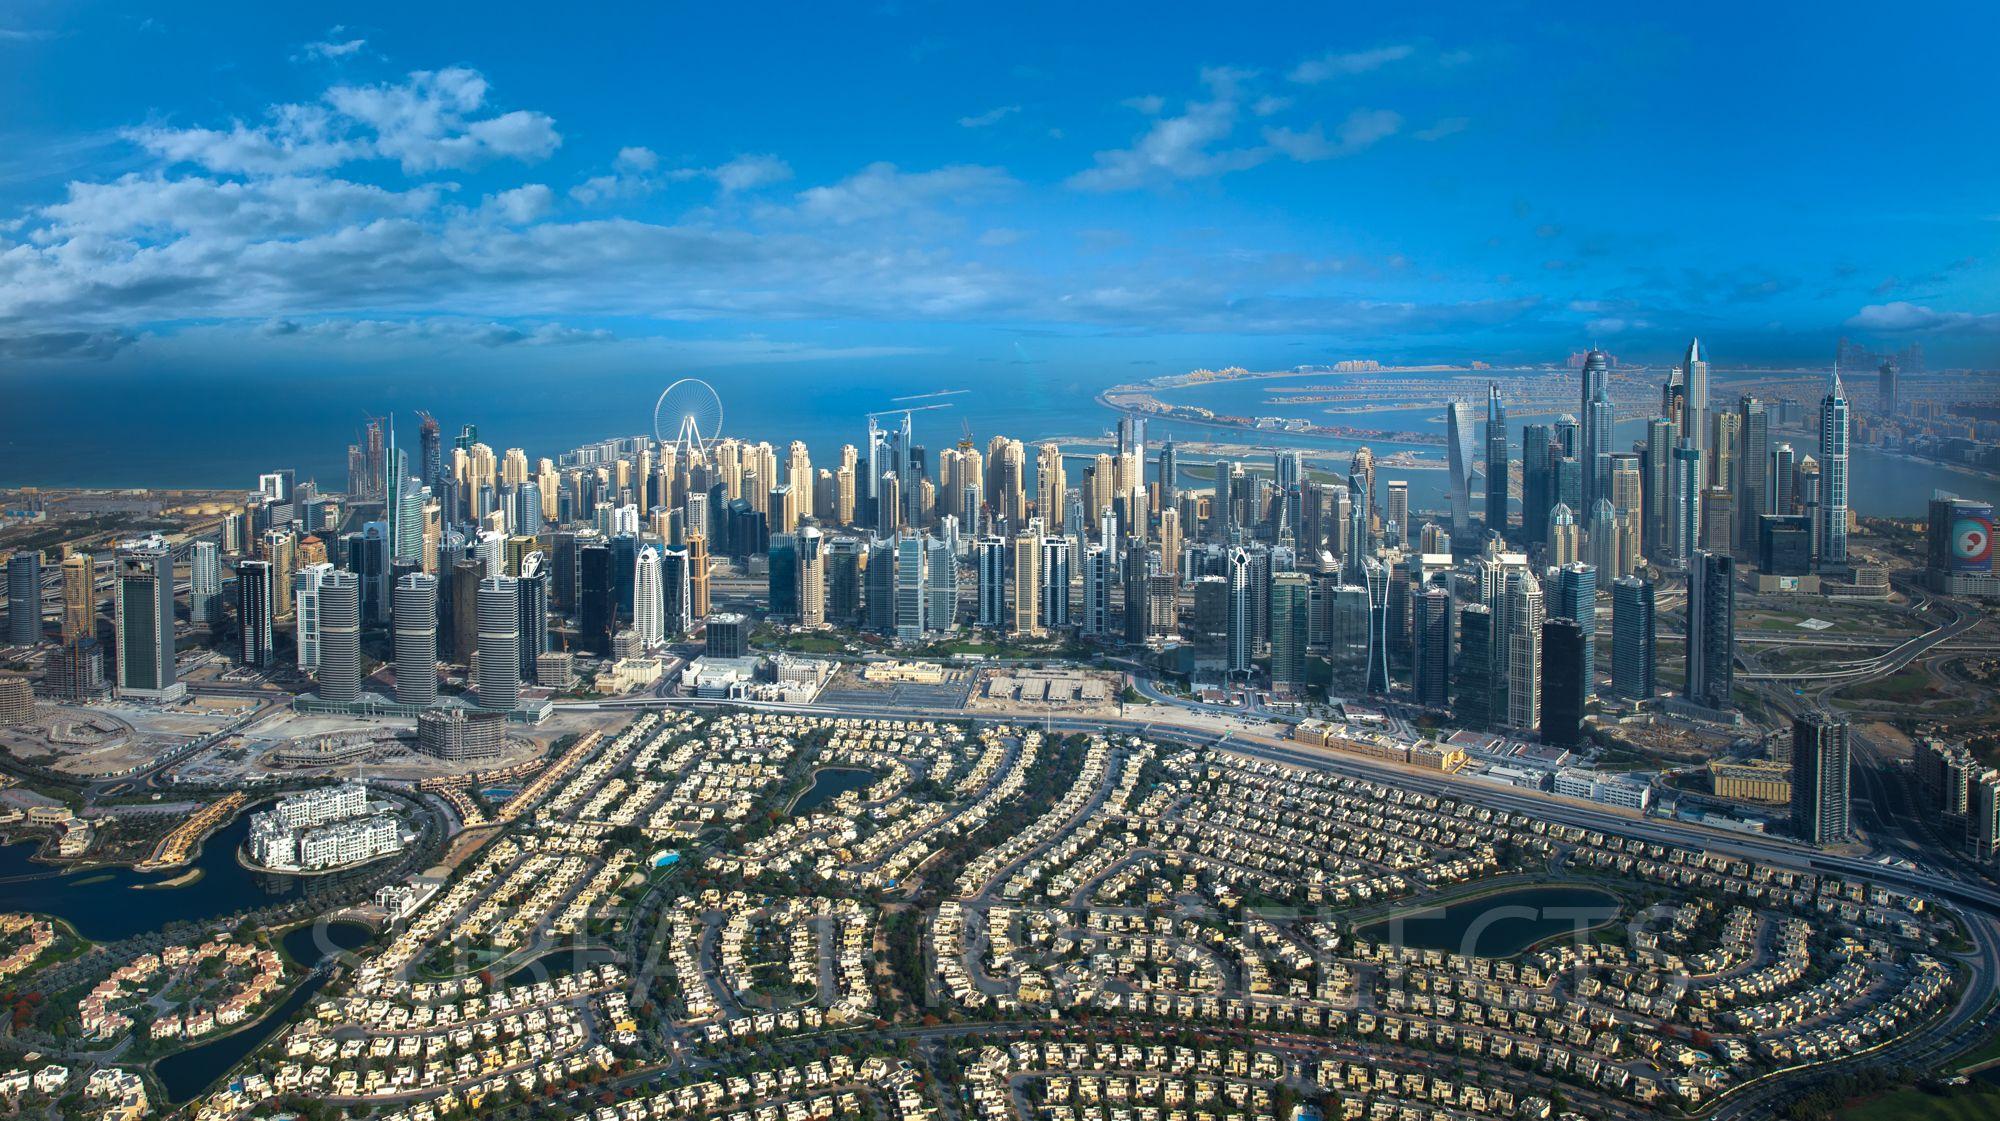 Dubai Aerial Photographer Dubai Architecture Photographer Dubai Photographer-1_079A0199-Edit.jpg